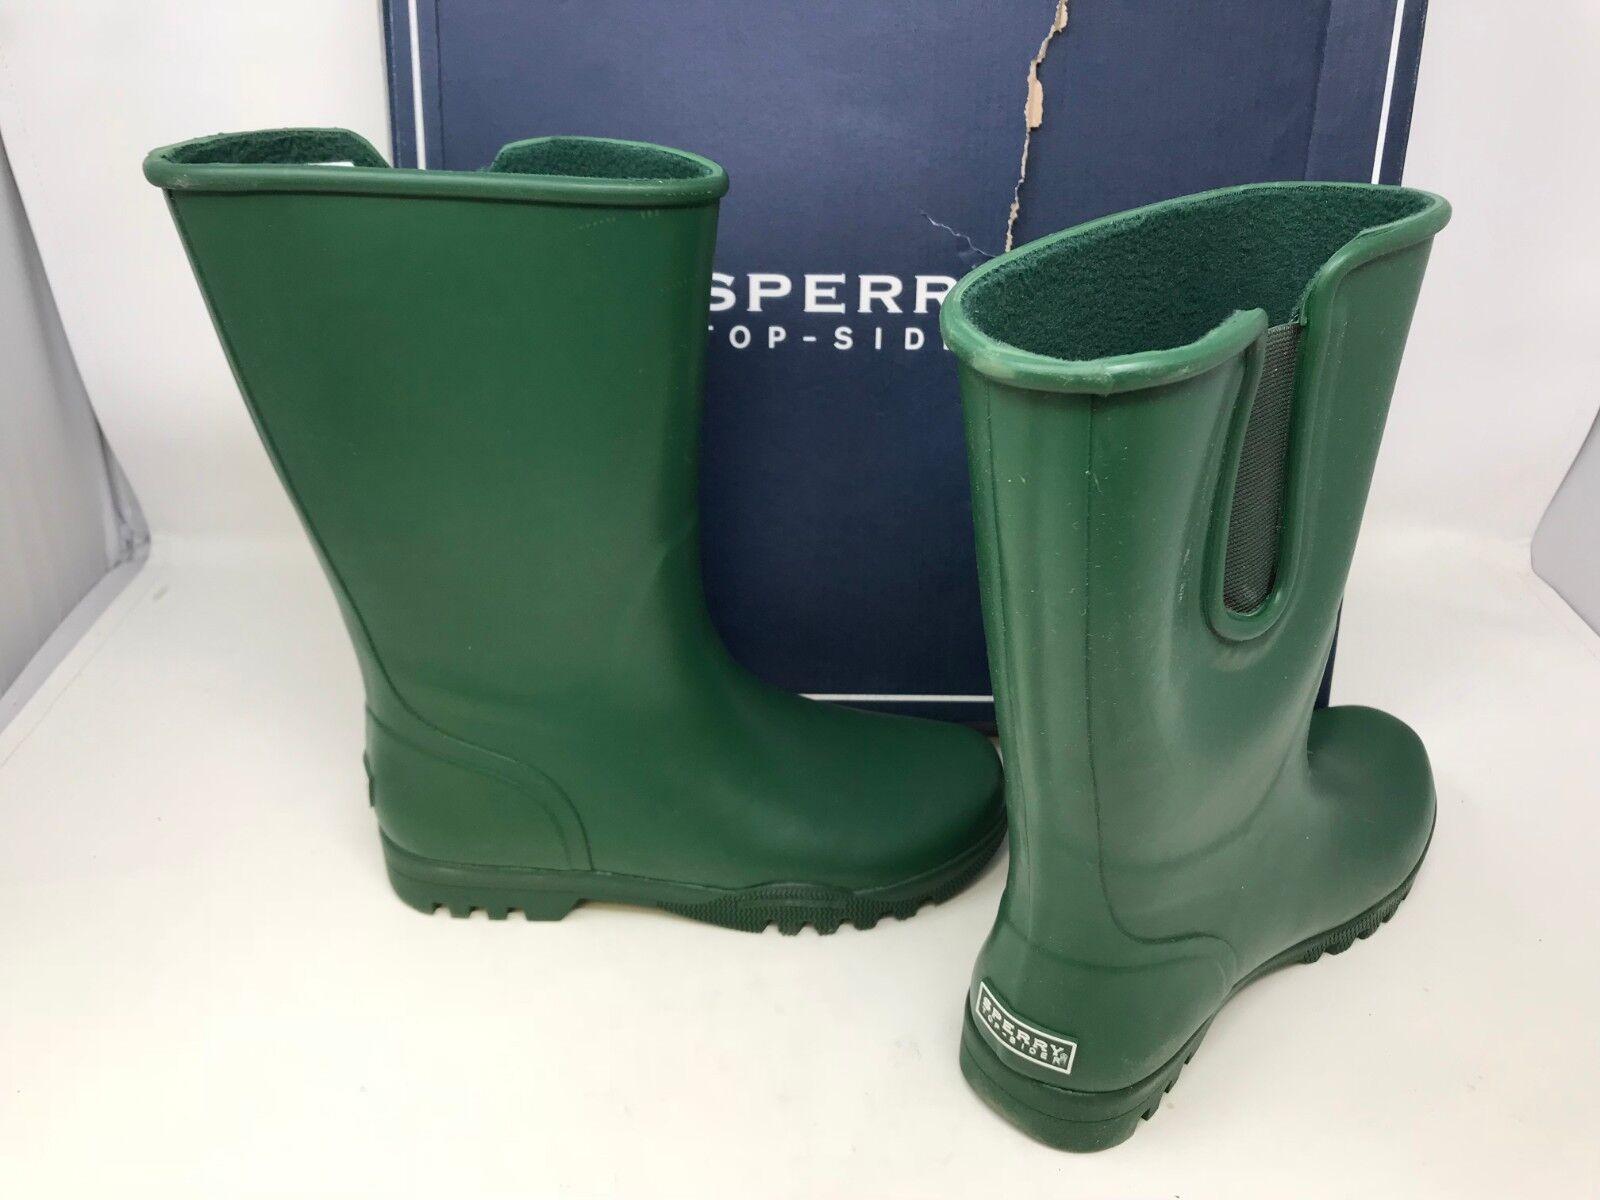 NEW  Sperry Top-Sider Women's Nellie Rain Boots Green Size 5 159B tz